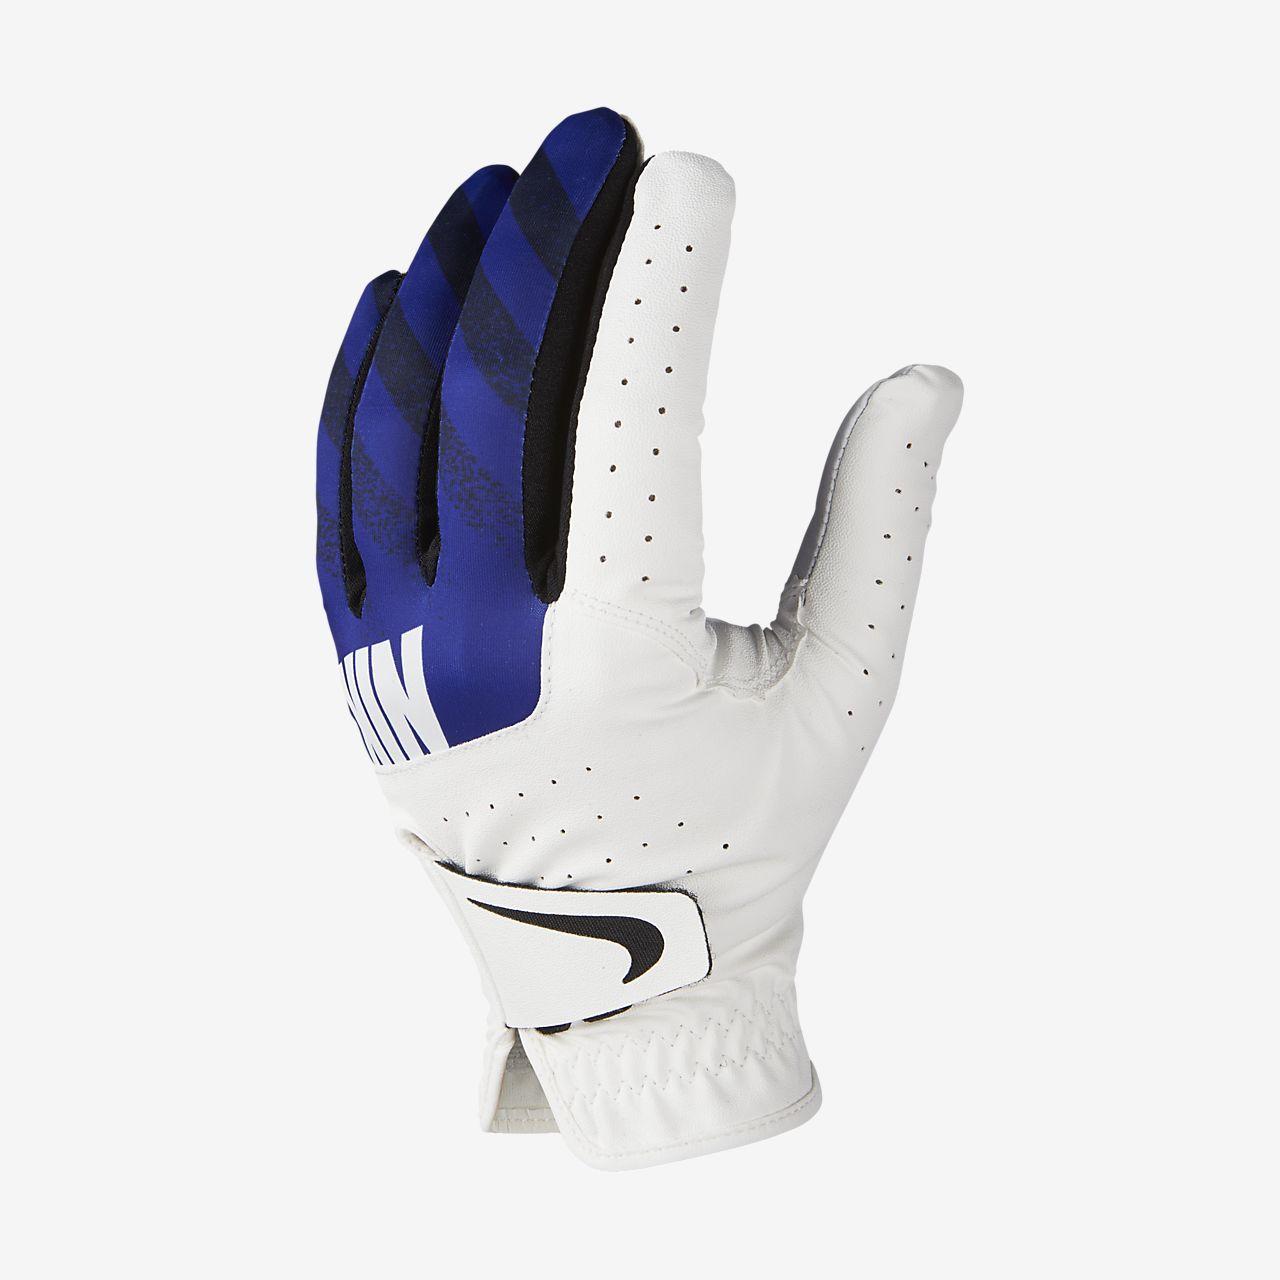 Nike Sport Herren-Golfhandschuh (Links regulär)